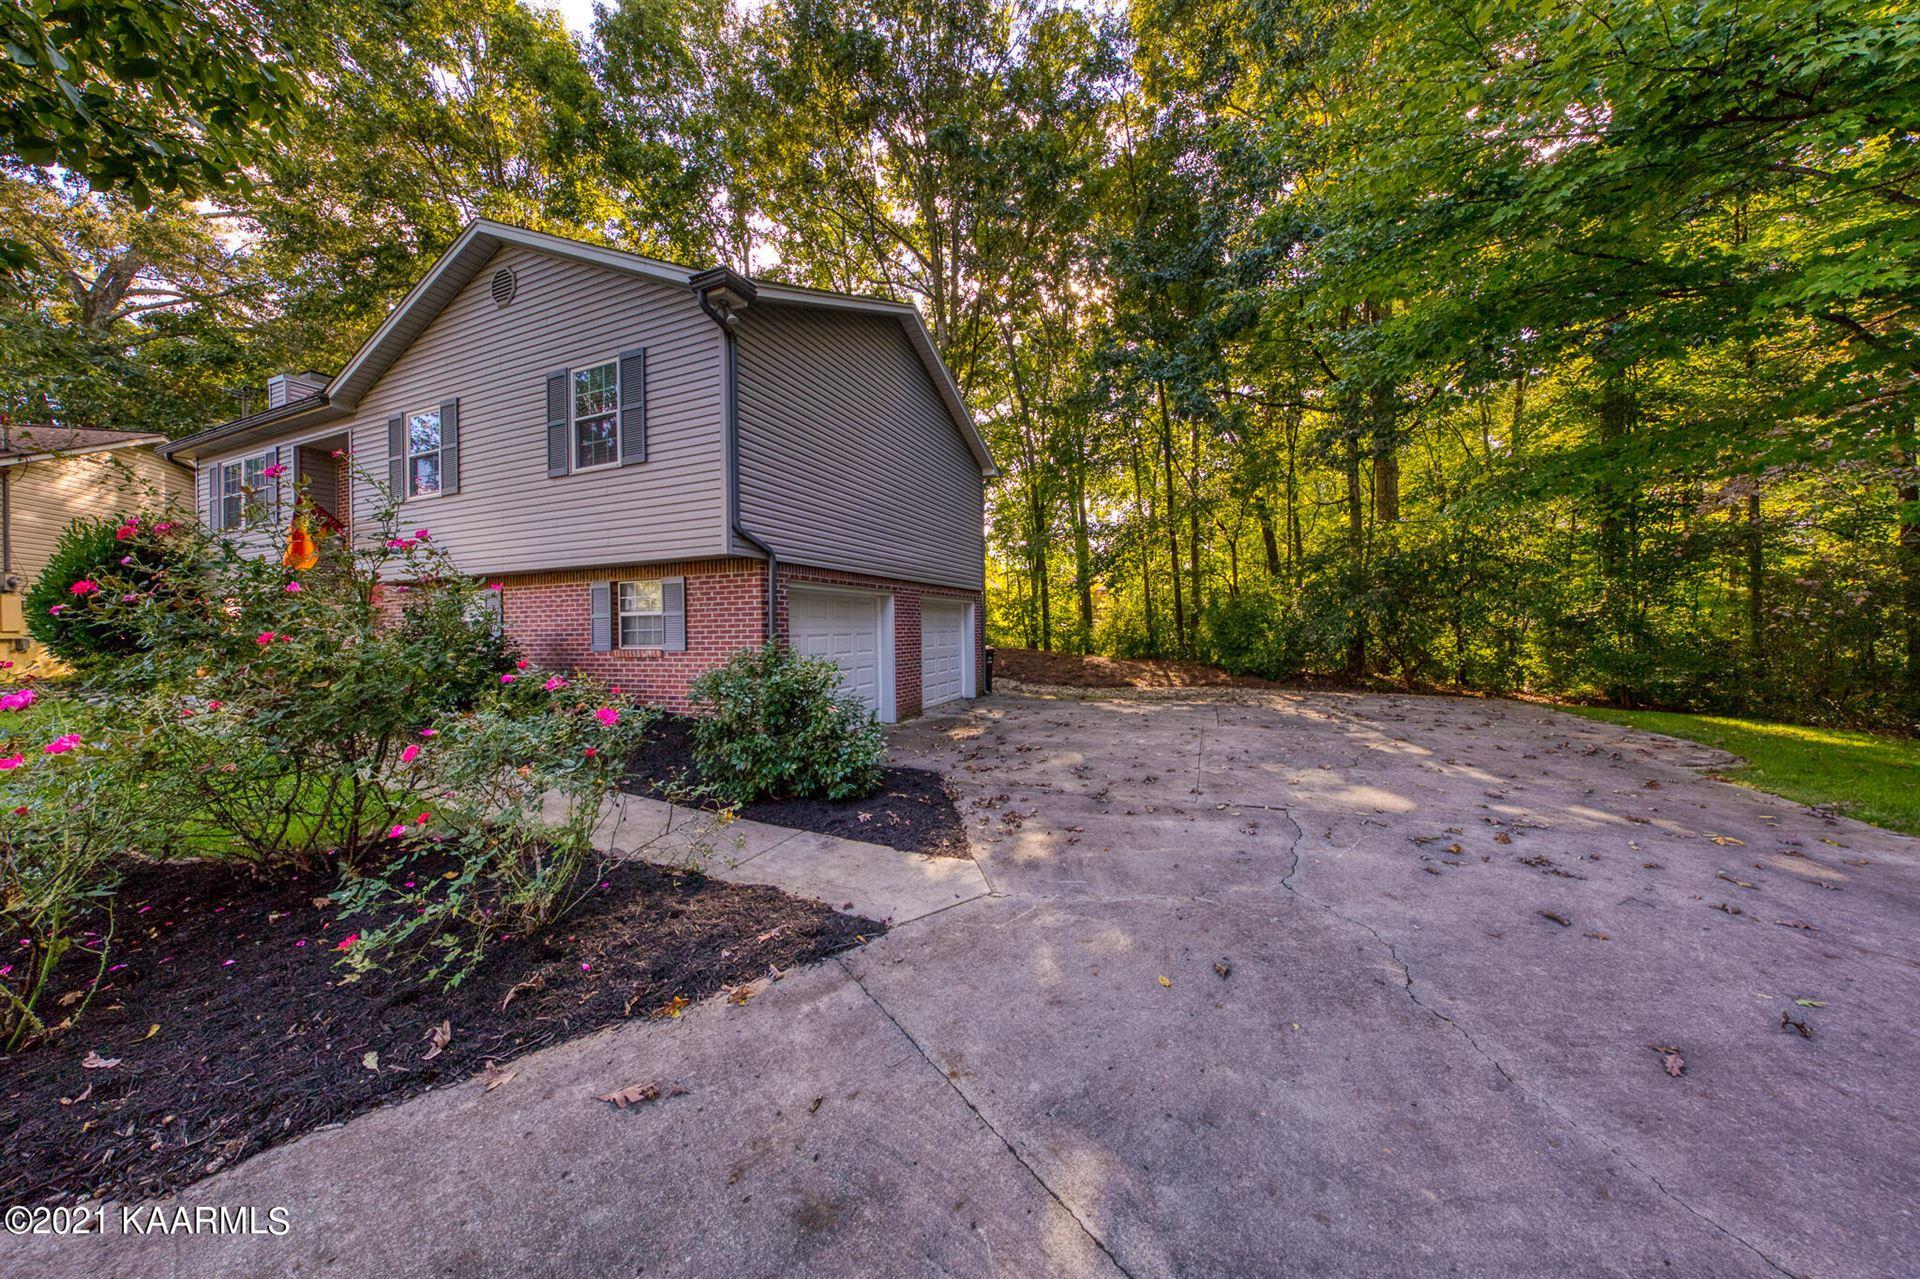 Photo of 1465 Waynesboro Lane, Knoxville, TN 37923 (MLS # 1170922)